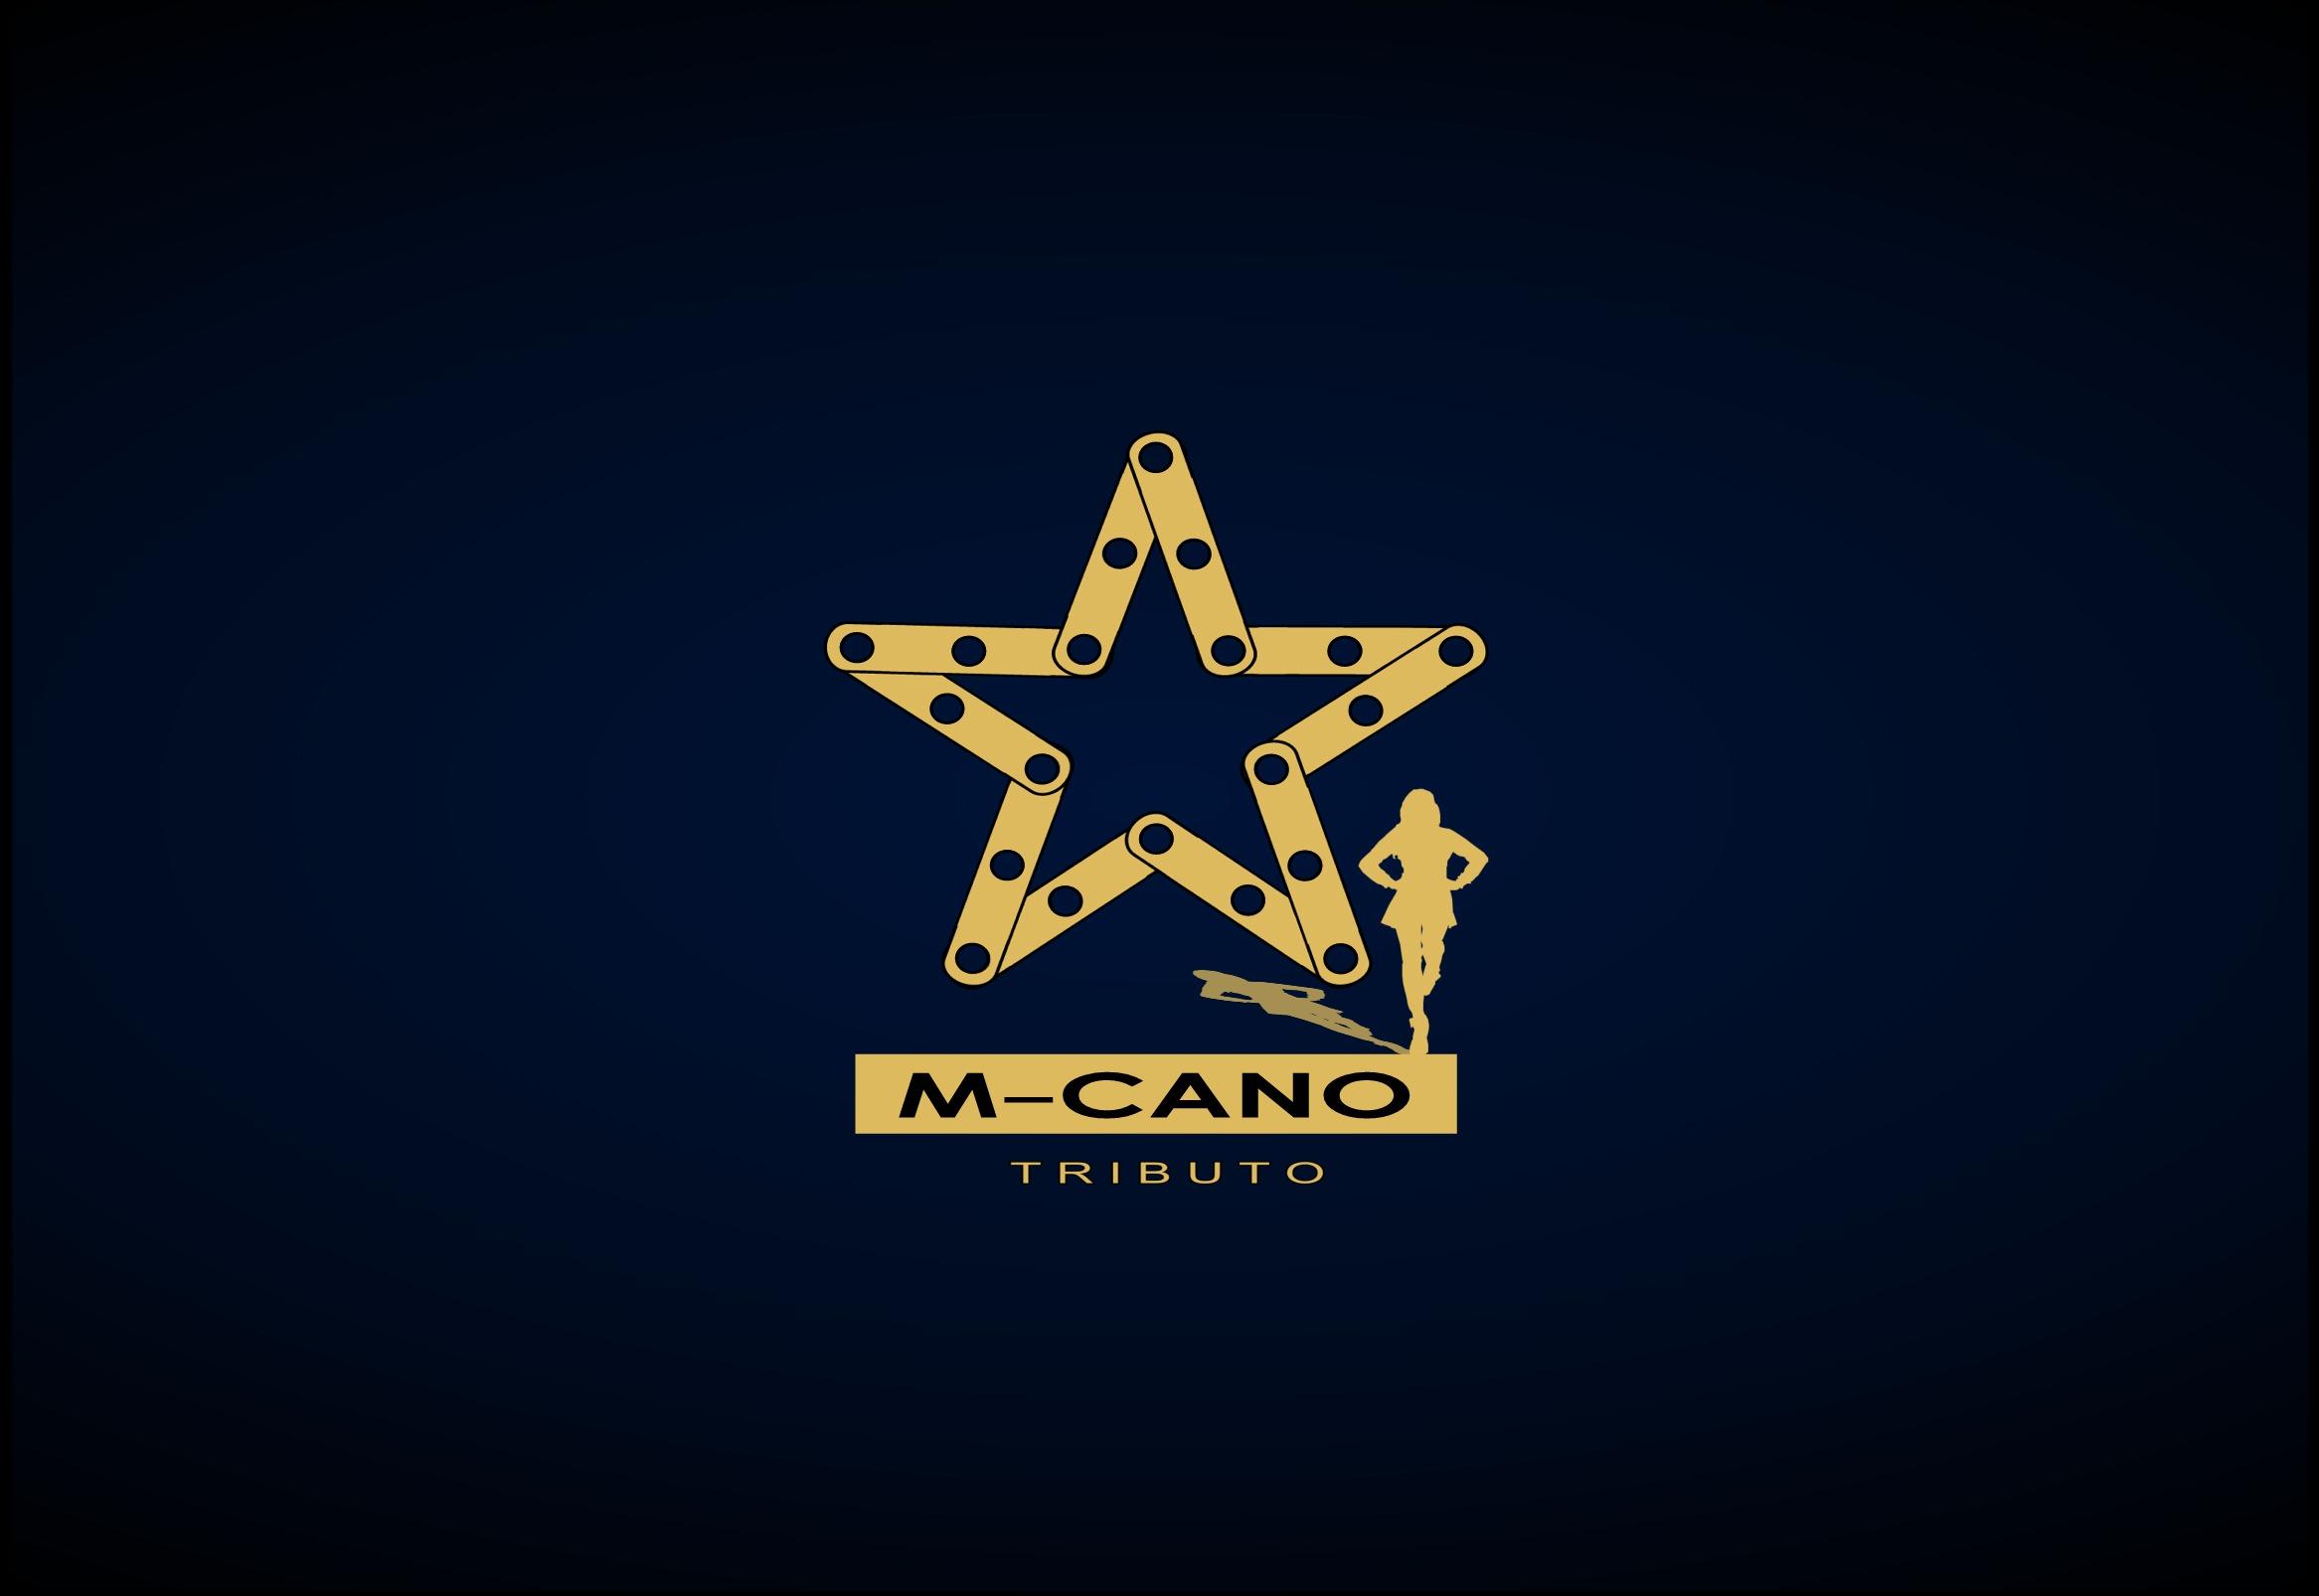 MCANO tributo a mecano Logo